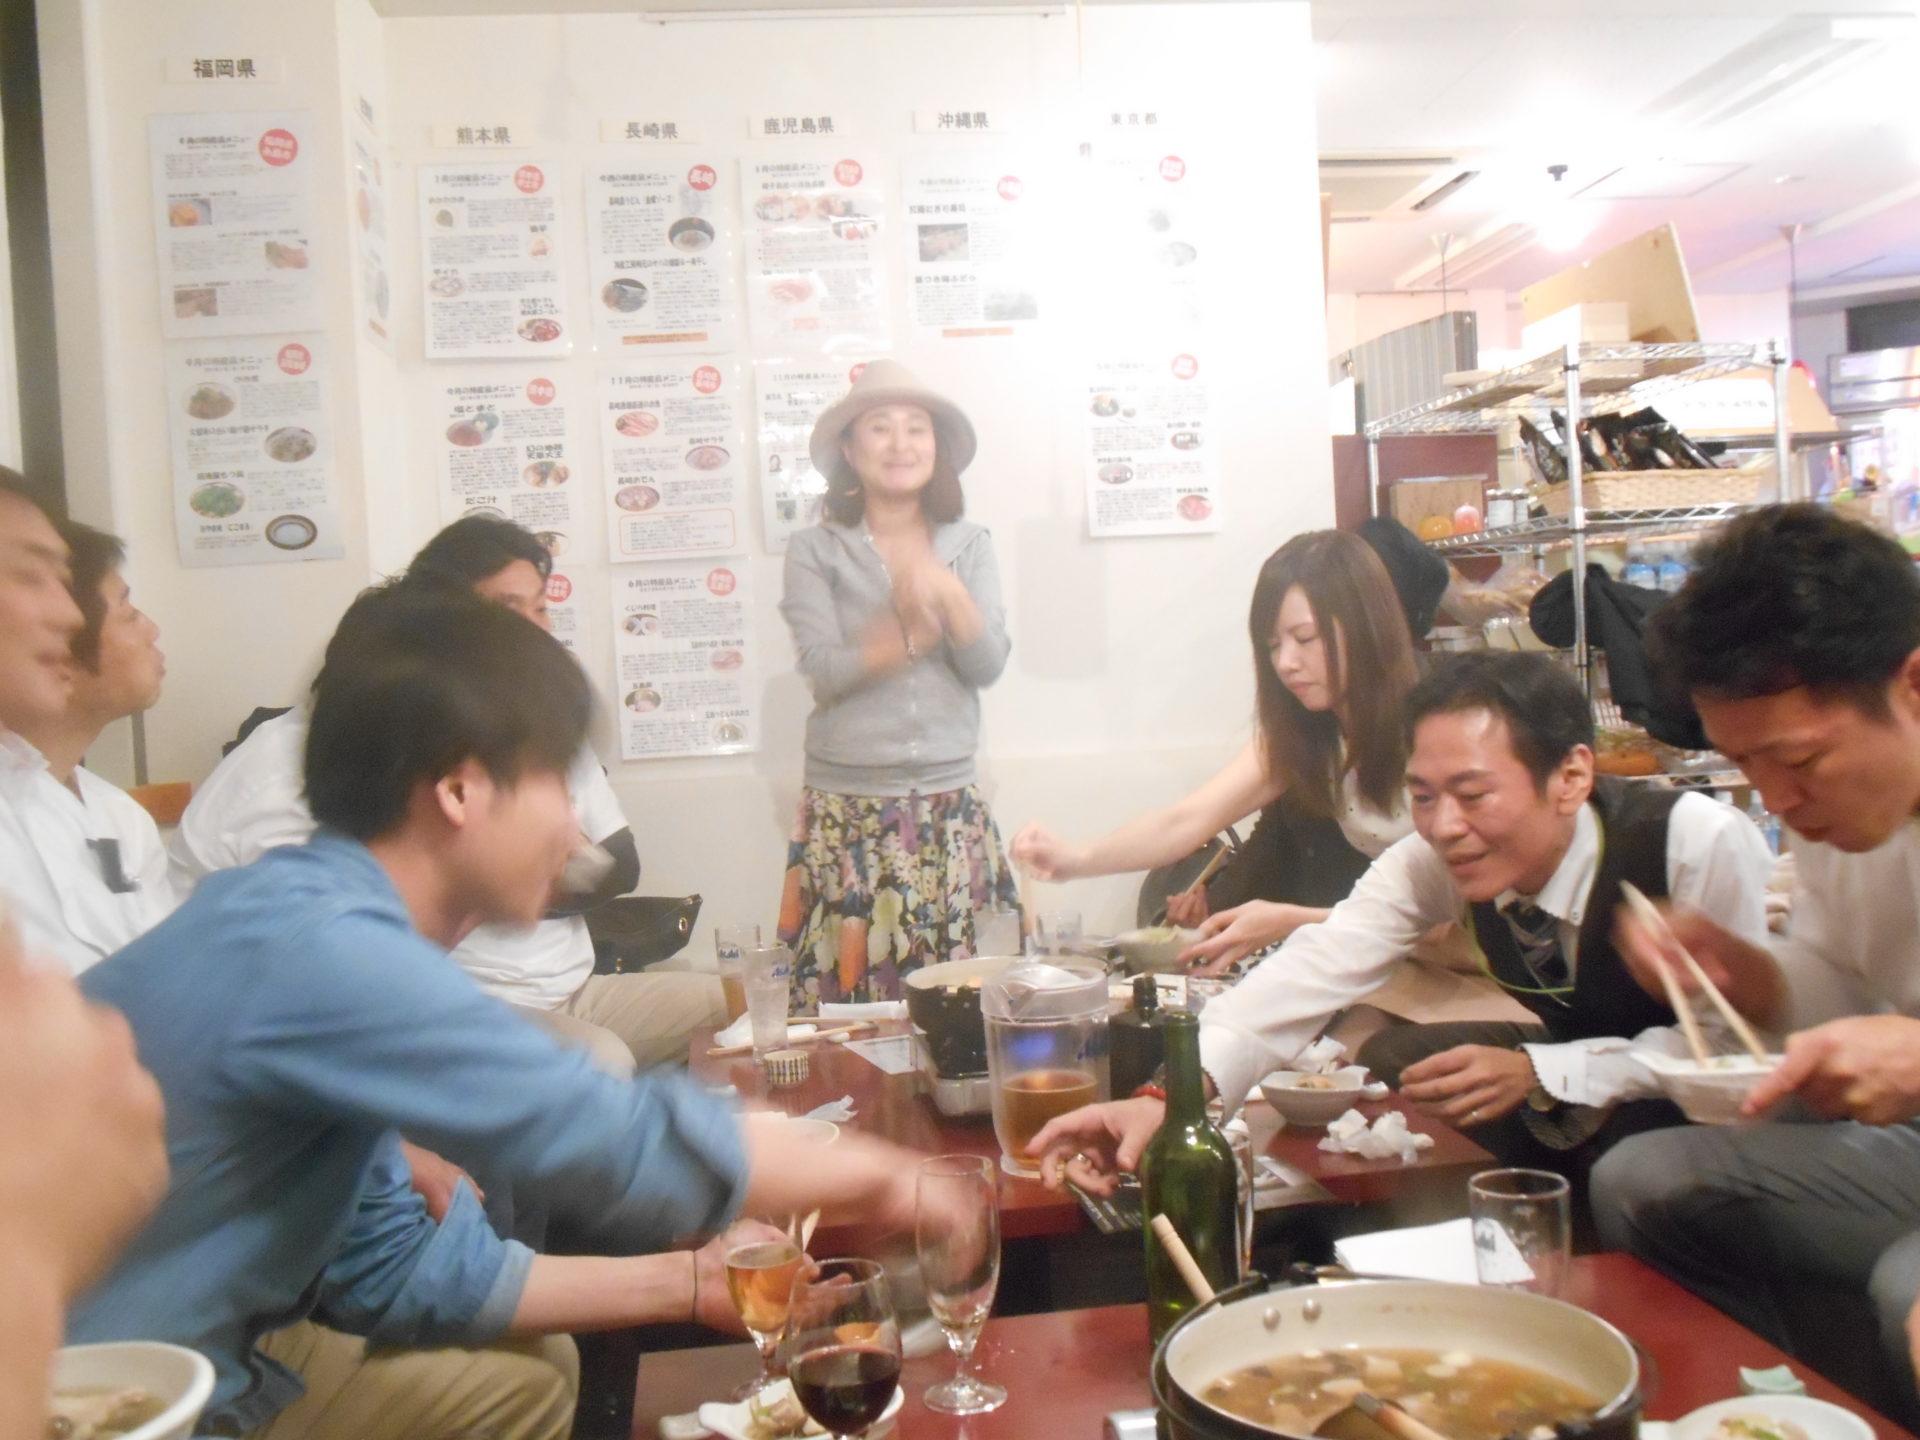 DSCN6035 1920x1440 - 2015年10月19日 AOsuki定例飲み会開催しました。